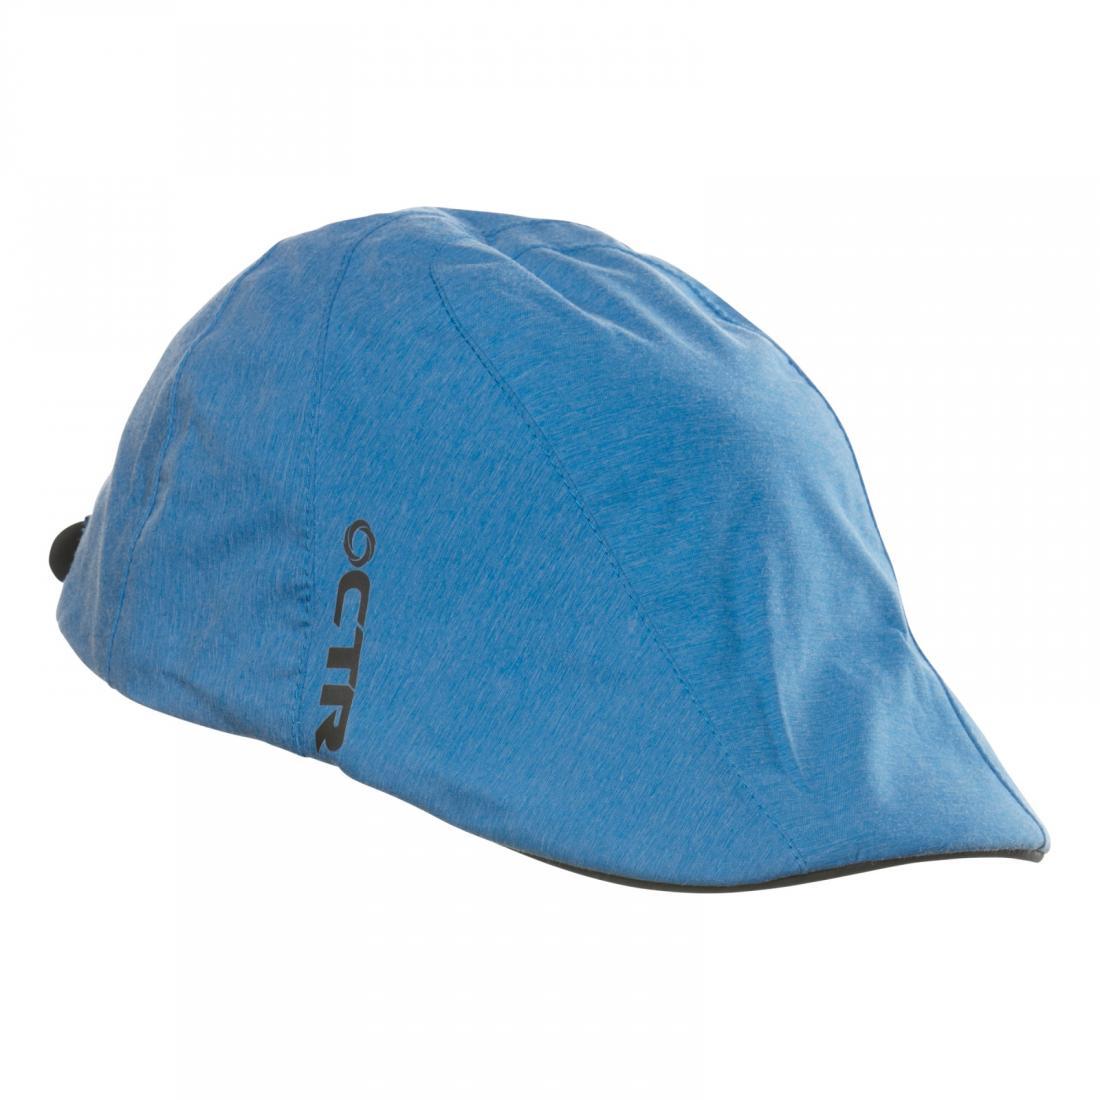 Кепка Chaos  Stratus Cabbie Rain HatКепки<br><br><br>Цвет: Голубой<br>Размер: S-M